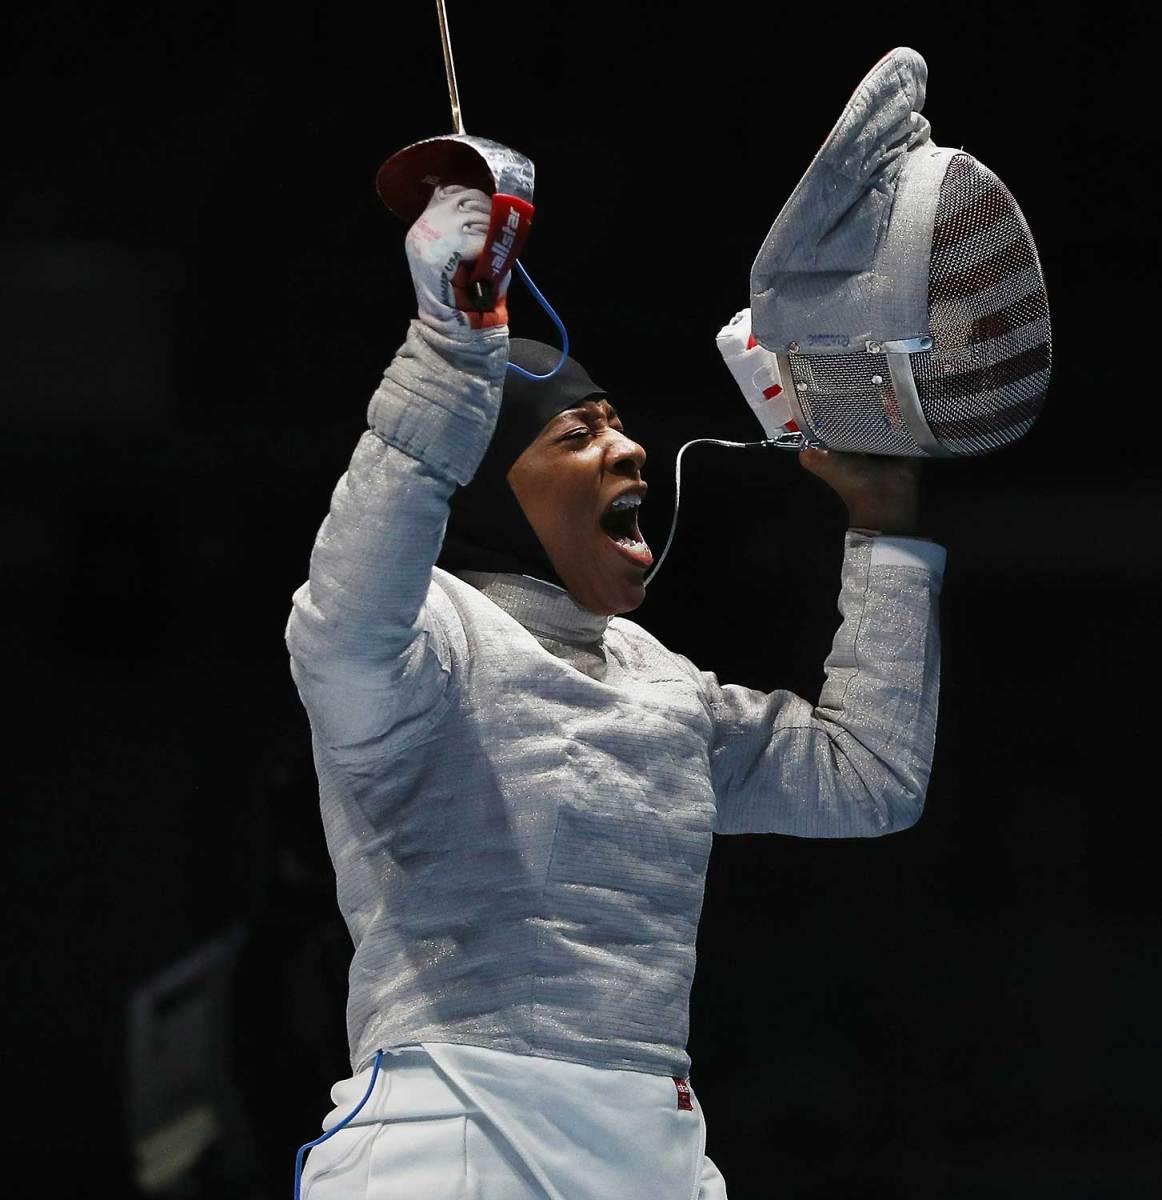 Best-photos-Day-3-2016-Rio-Olympics-1.jpg